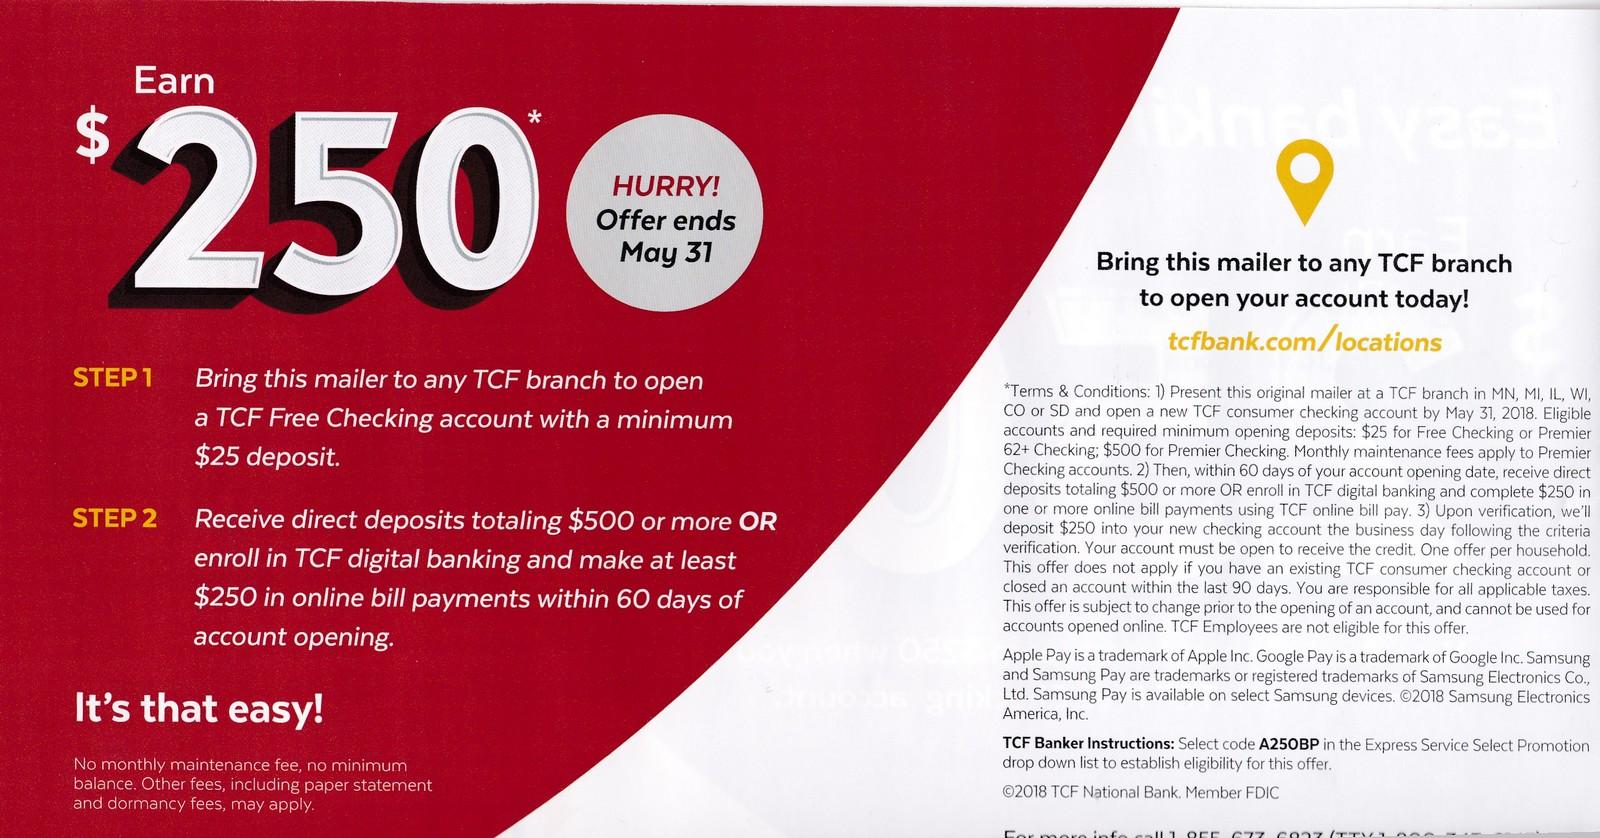 Expired] TCF Bank, $250 Checking Account Bonus (Targeted